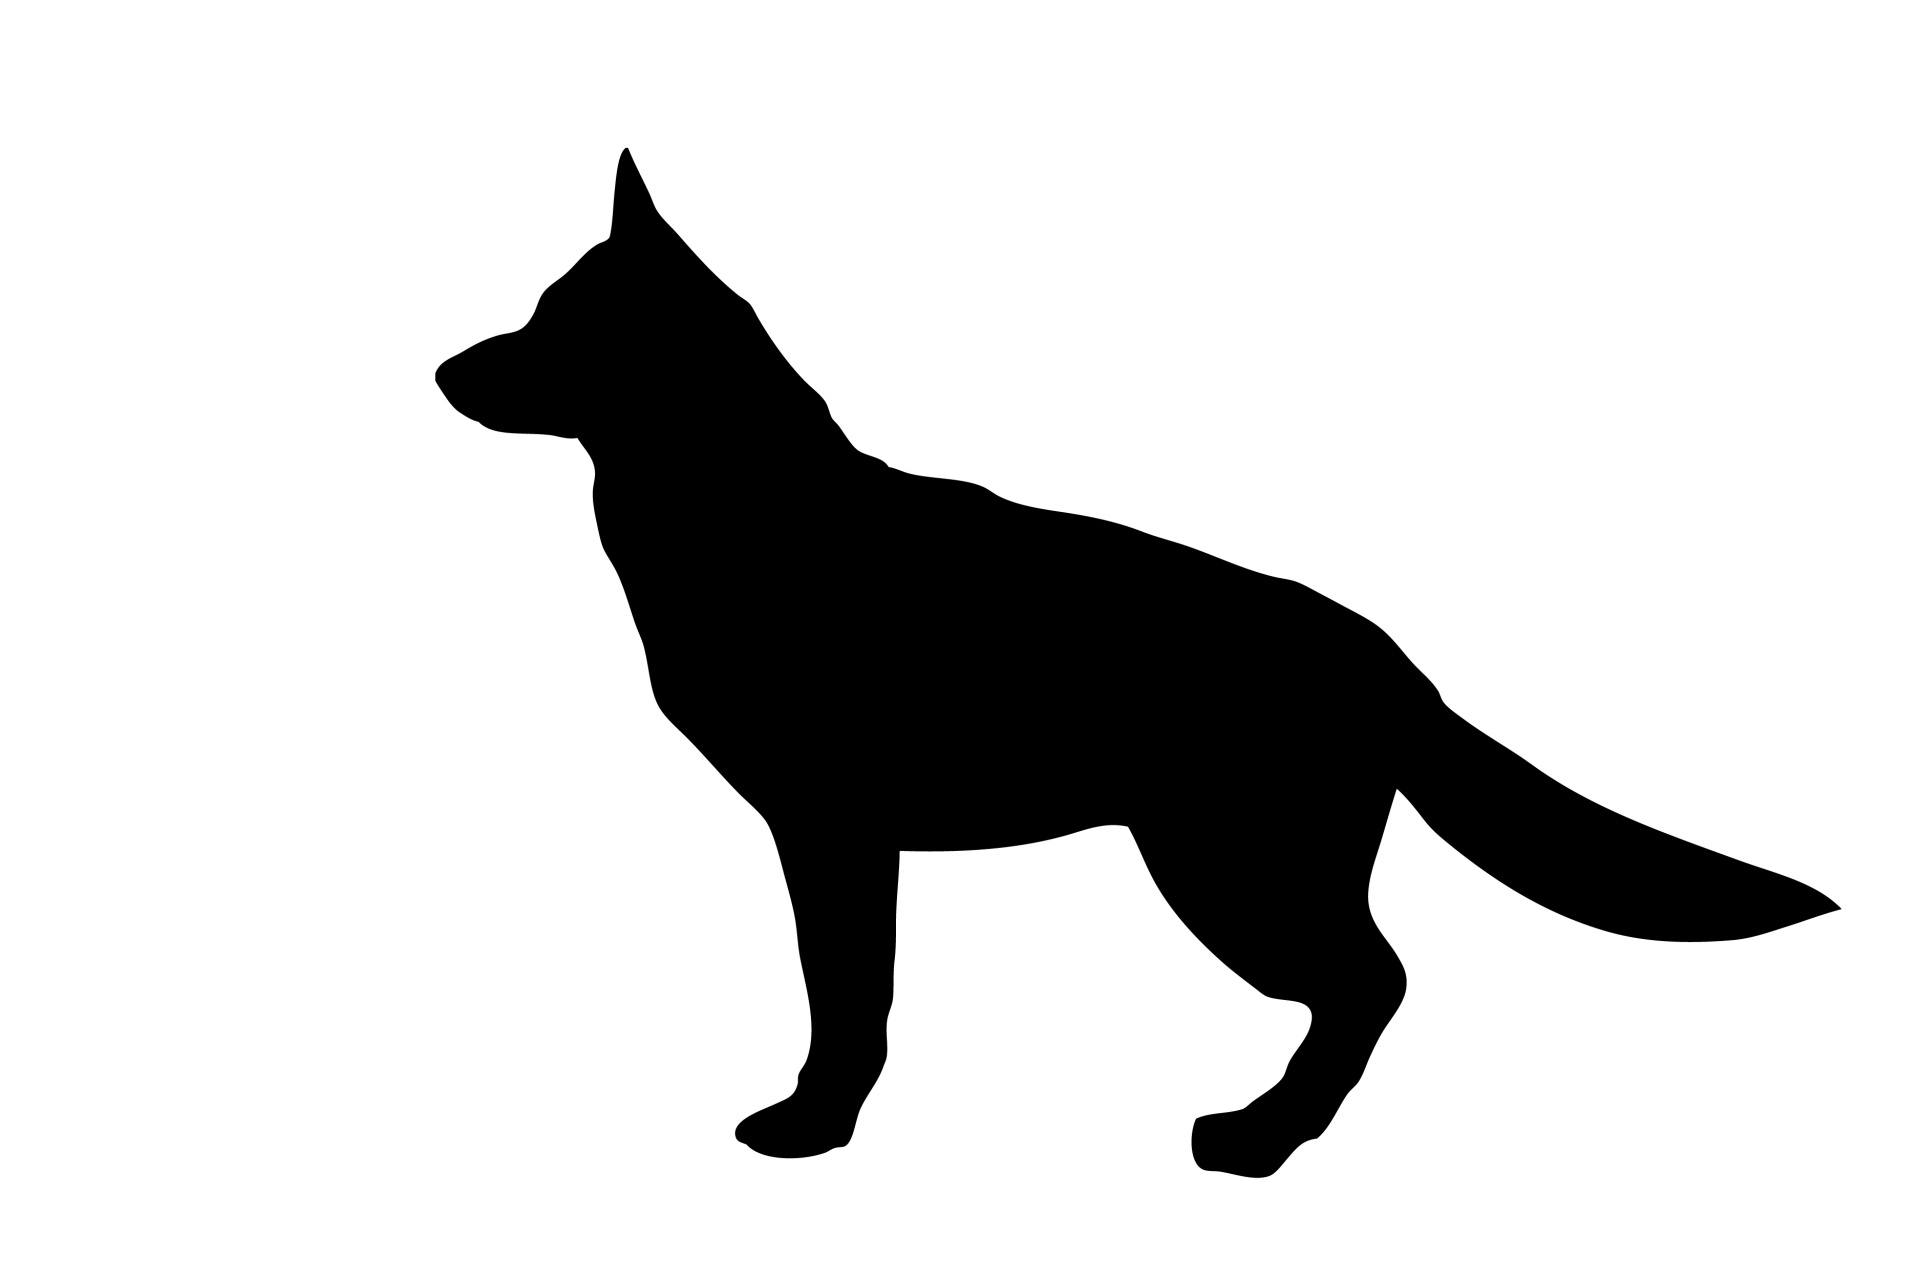 1920x1280 German Shepherd Dog Silhouette Free Stock Photo